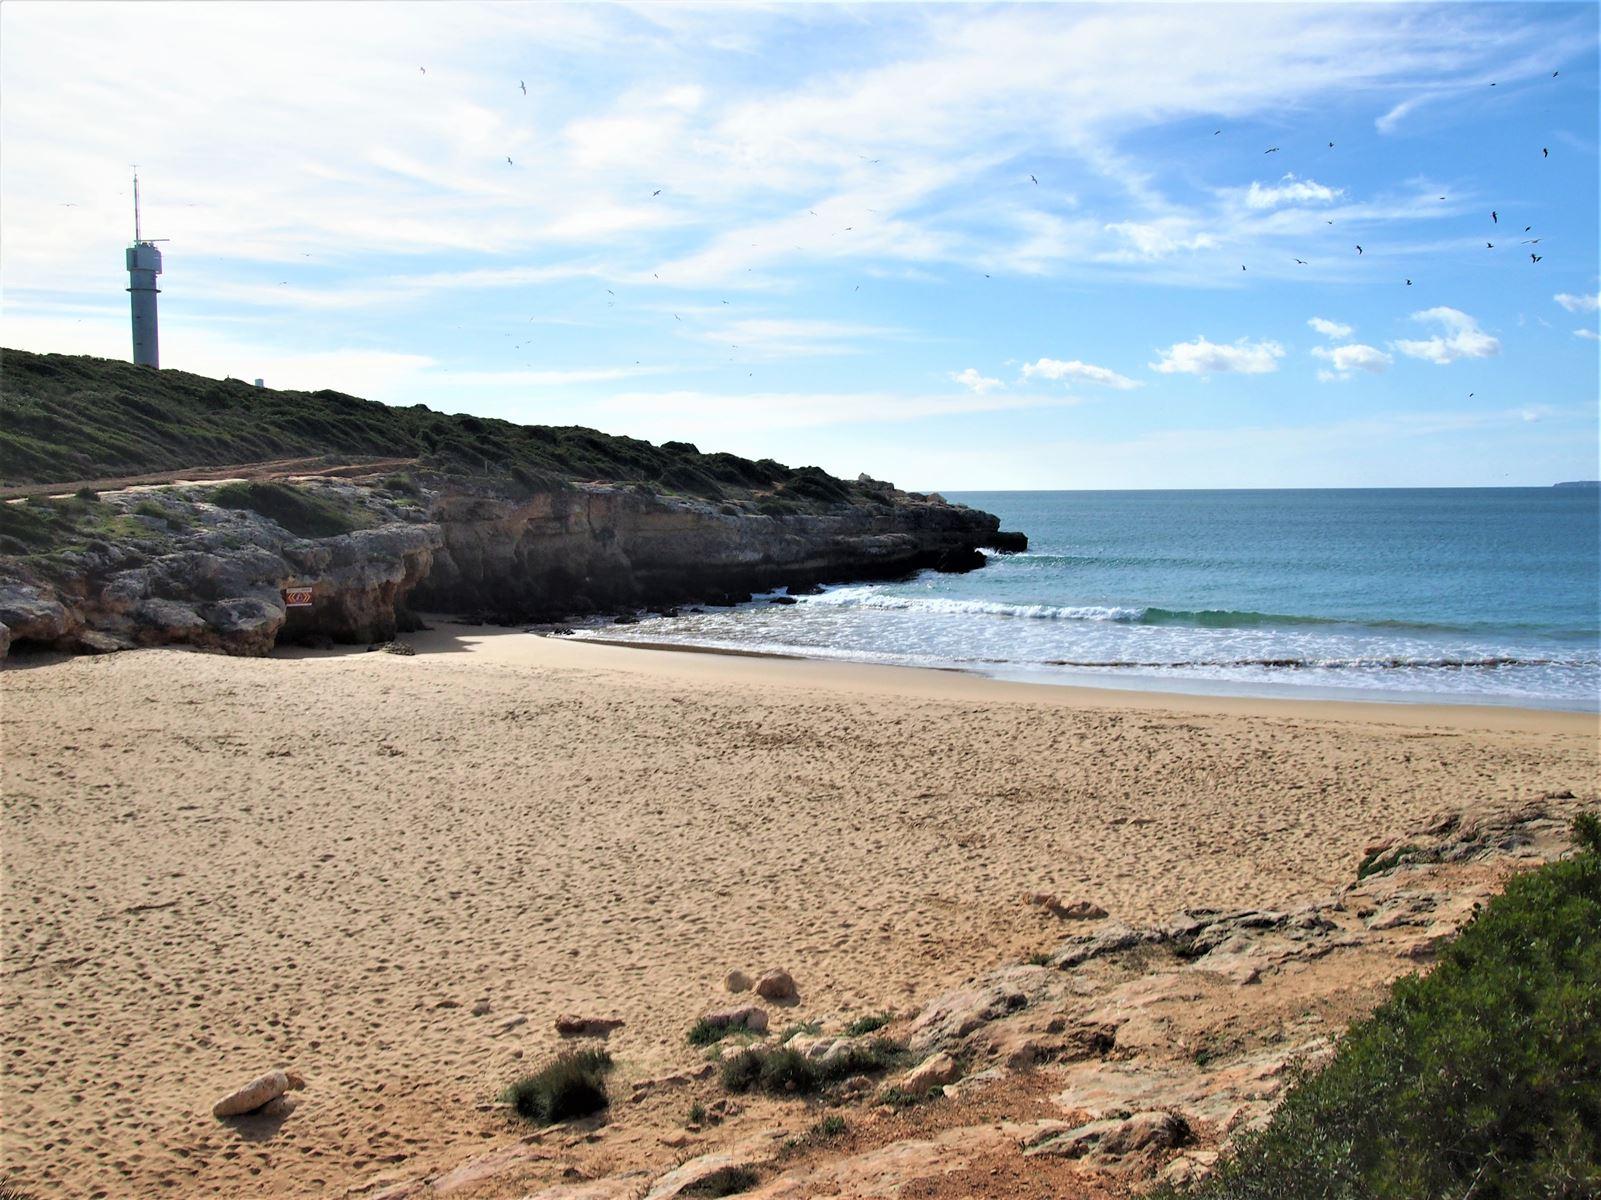 Praia do Pintadinho, Ferragudo, Algarve